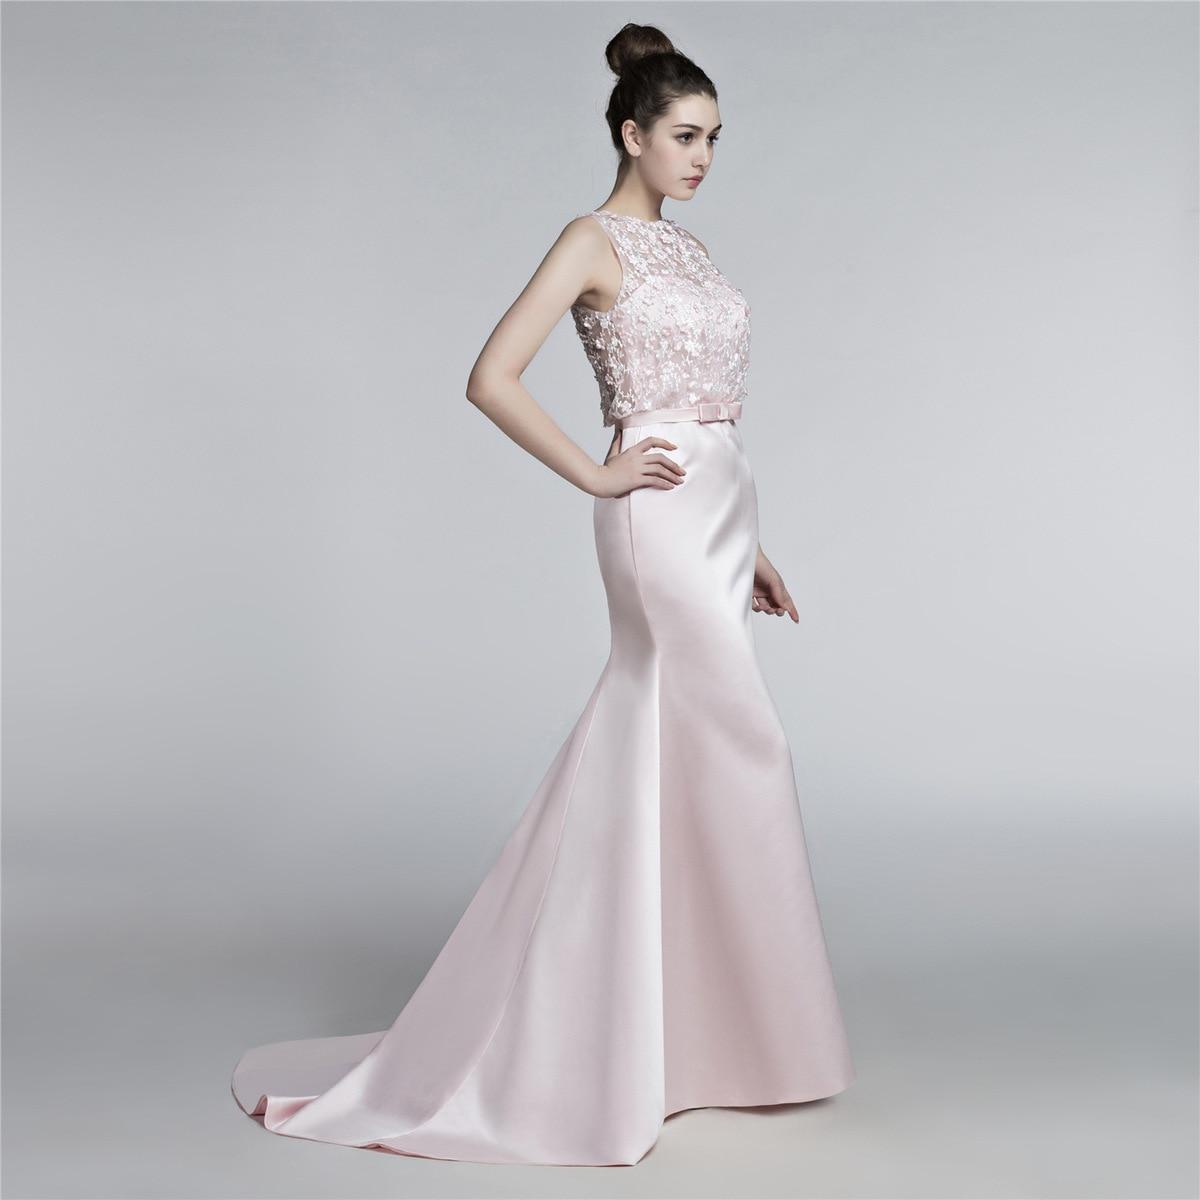 Robes Pink Bal Rose Soirée Colour Kaftan Robe Sirène Formelle Kleider De 2018 Longue Abend Festa 354jRLAq